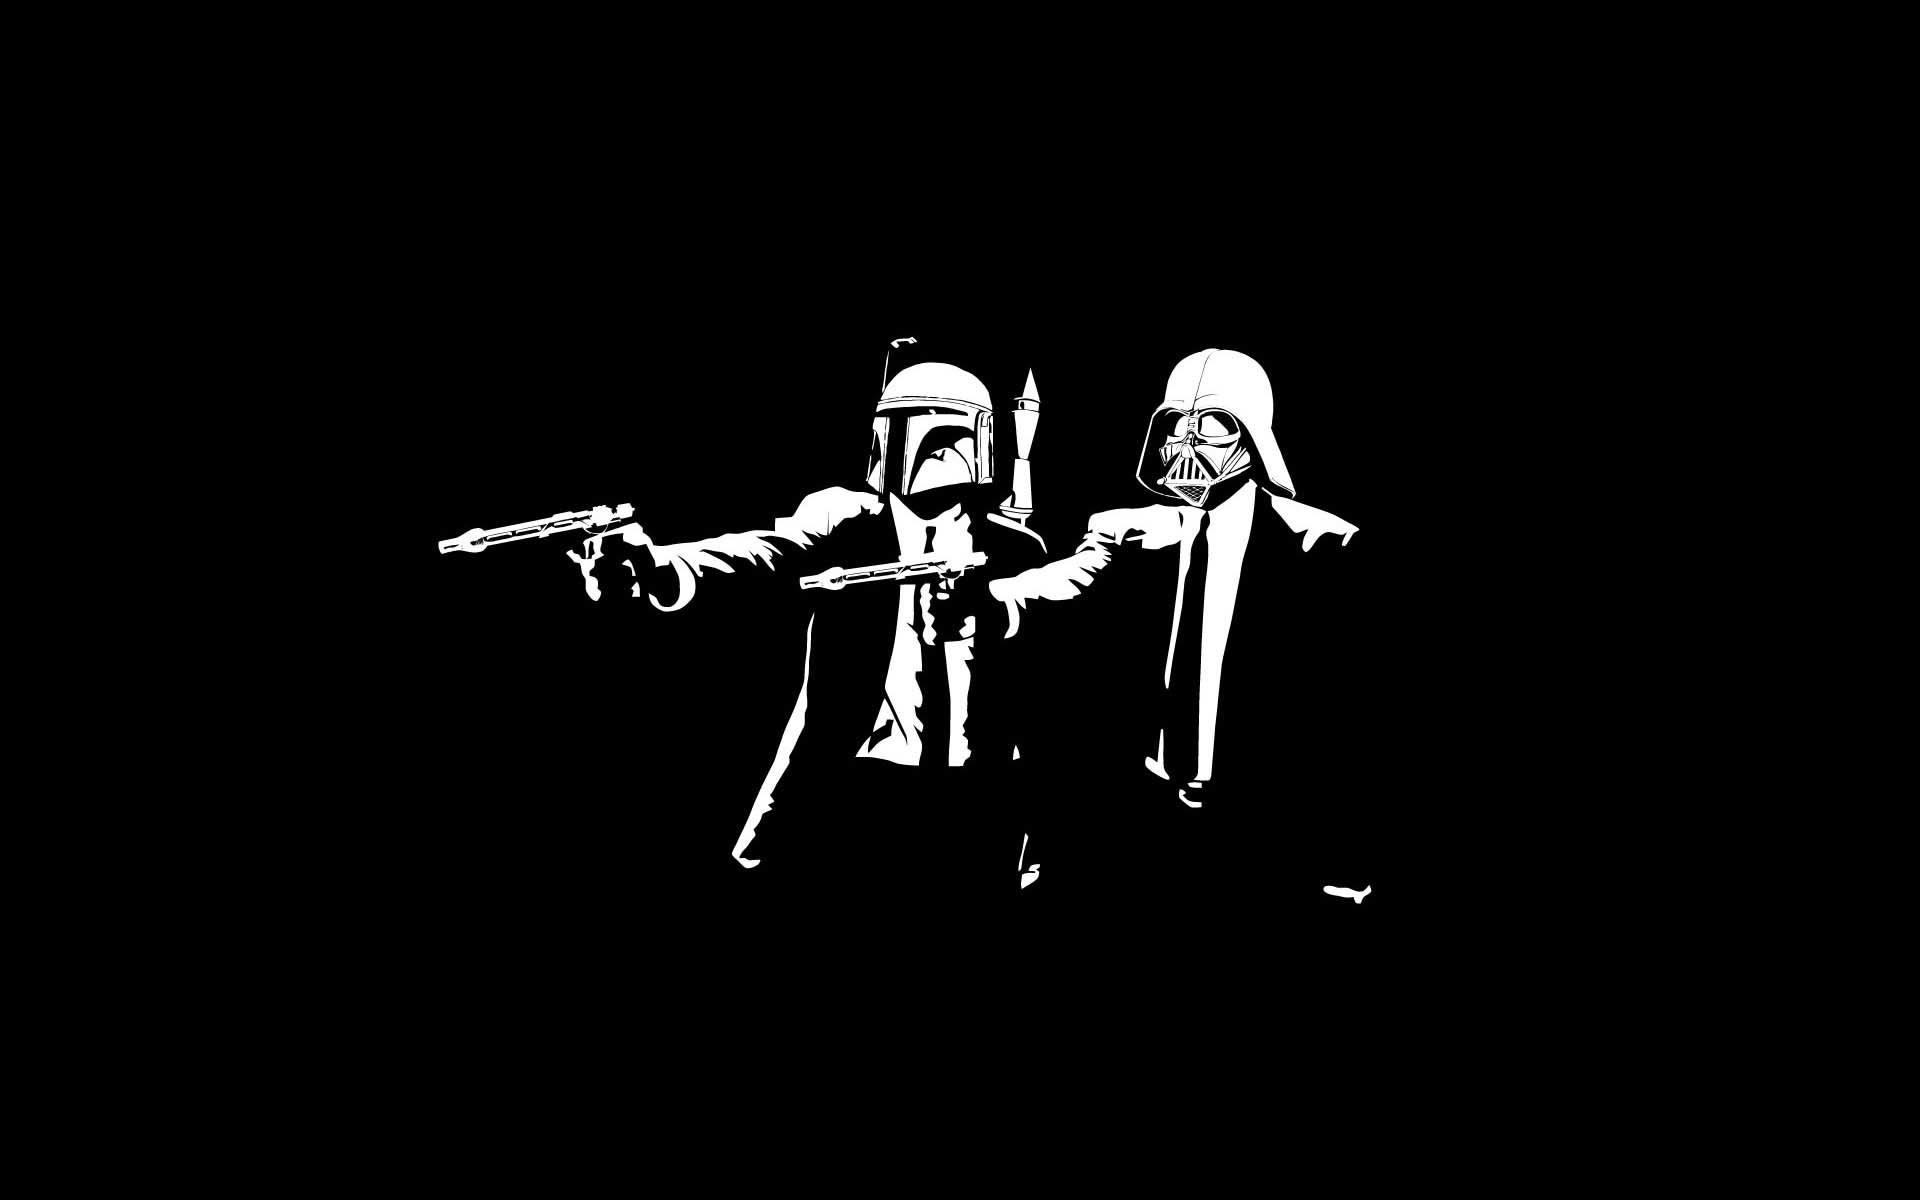 Stormtrooper Iphone Wallpaper Background for Desktop – Uncalke.com